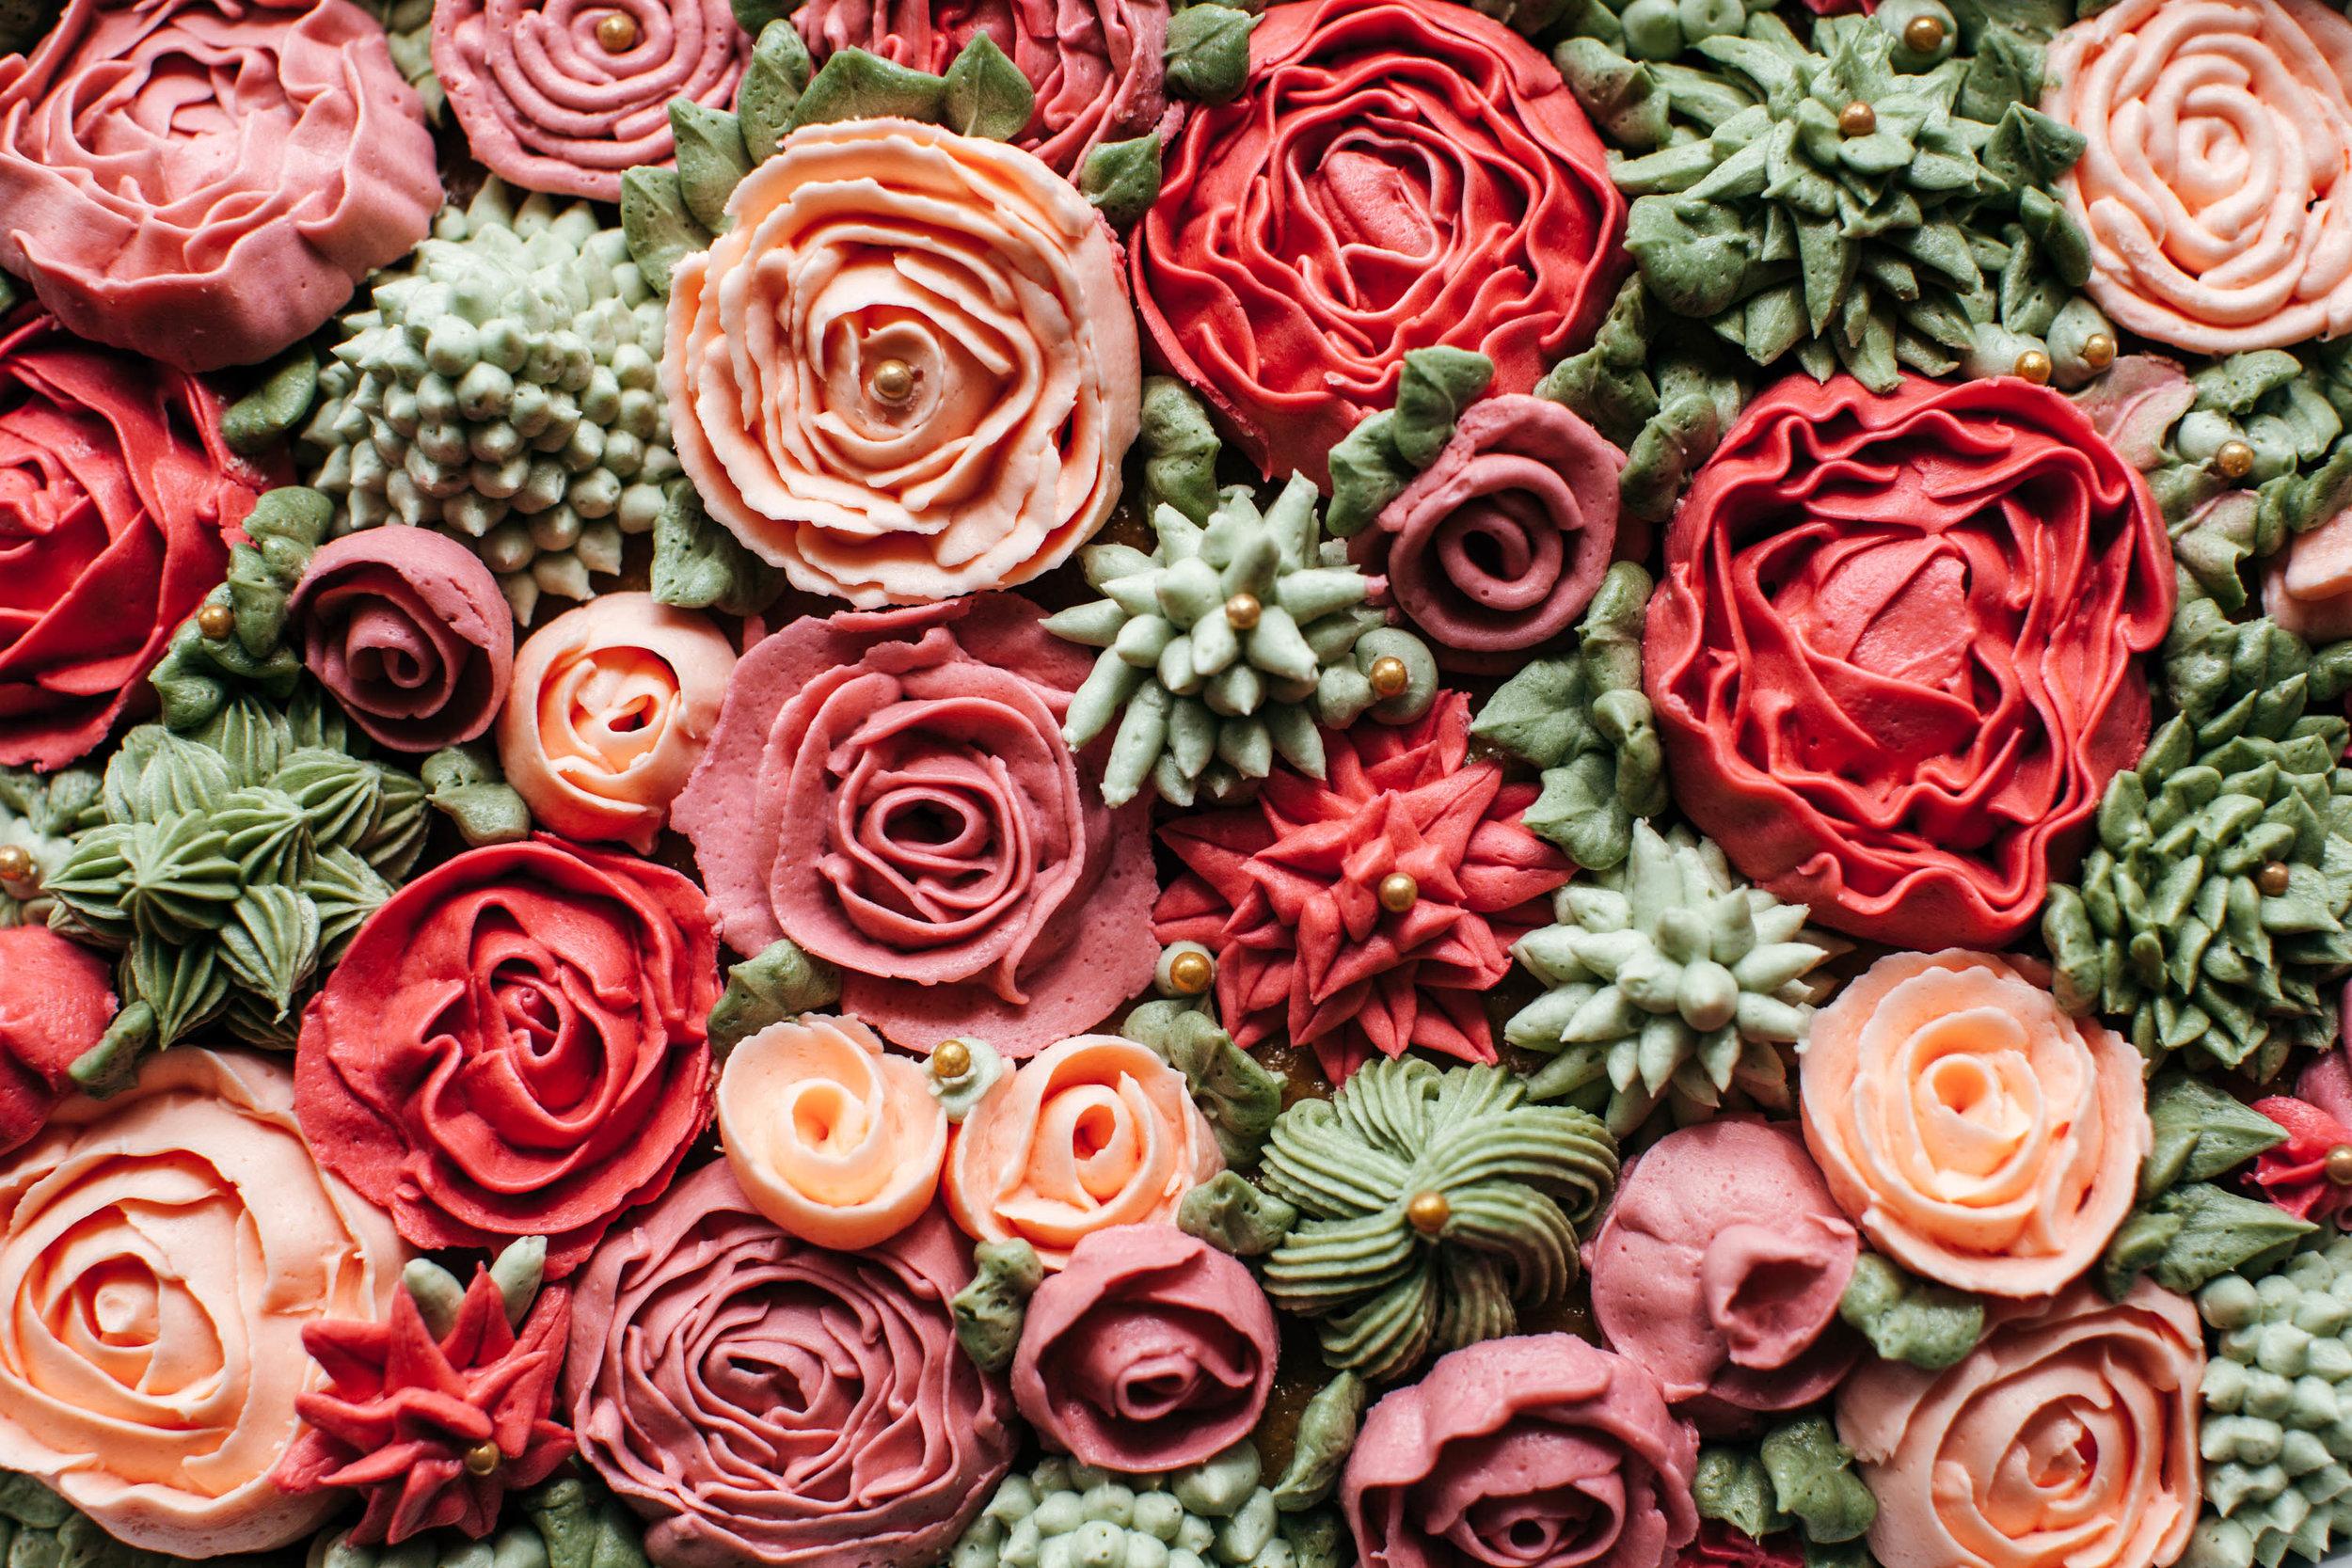 rose rose cake-12.jpg